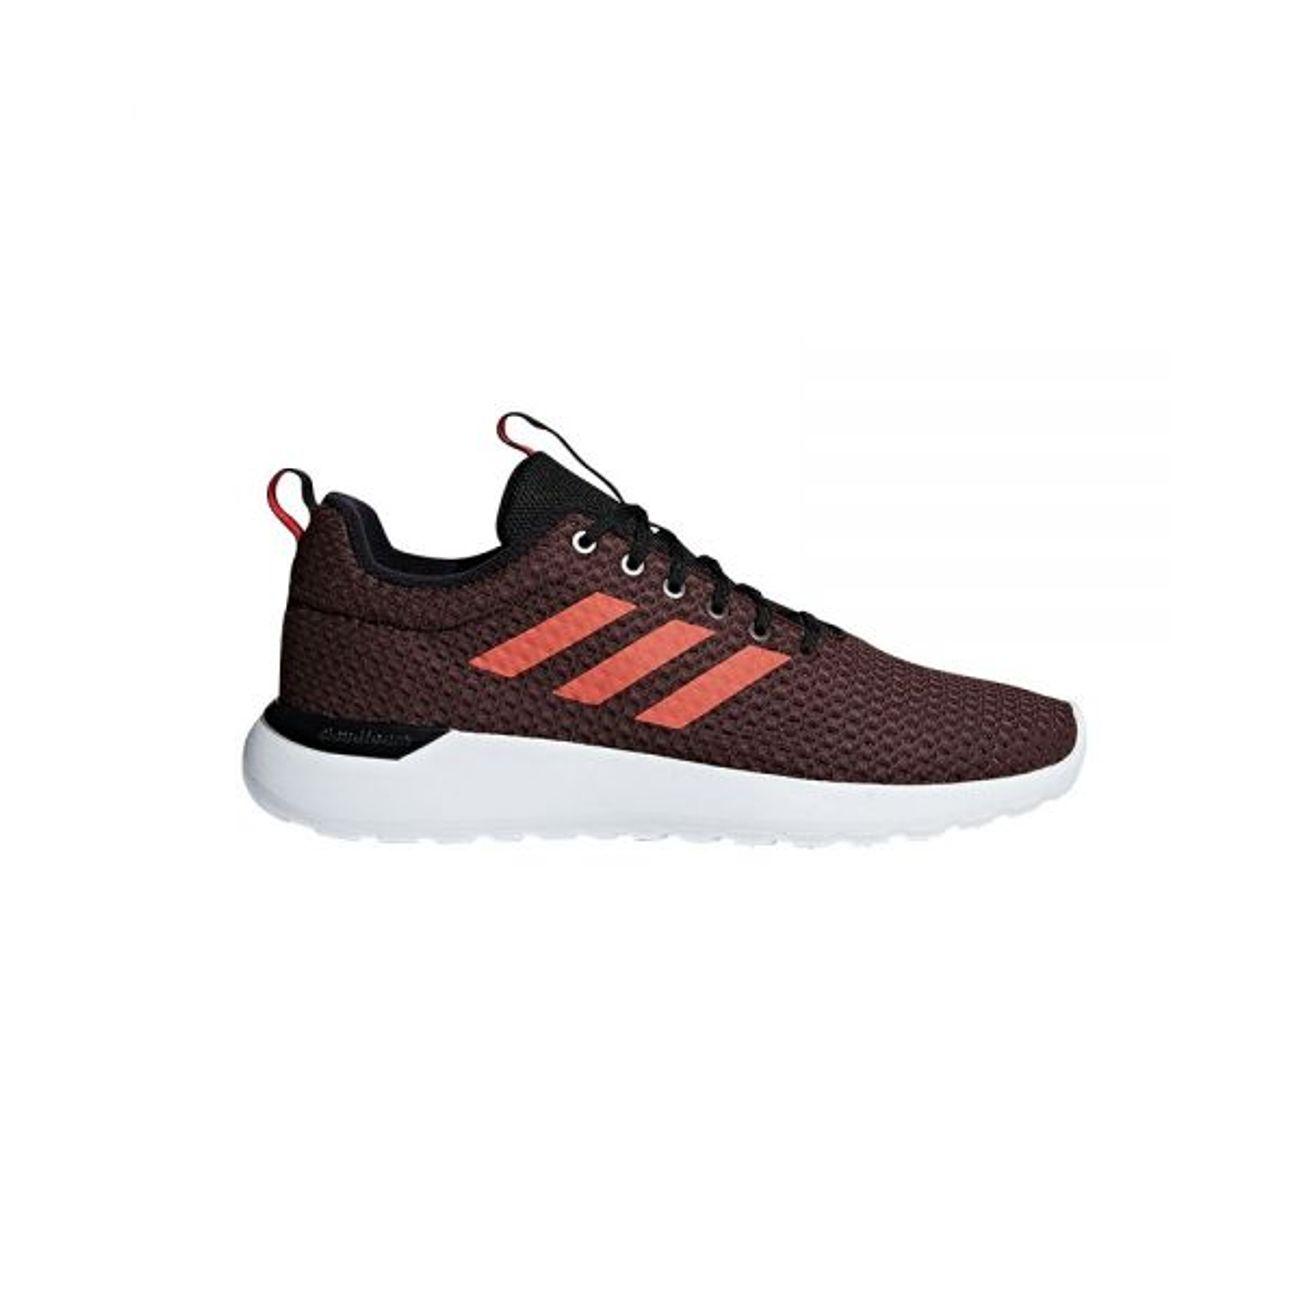 Adidas Lite Racer Orange Neo Cln Bb7481 Adulte Running Marron fyb6Yv7g